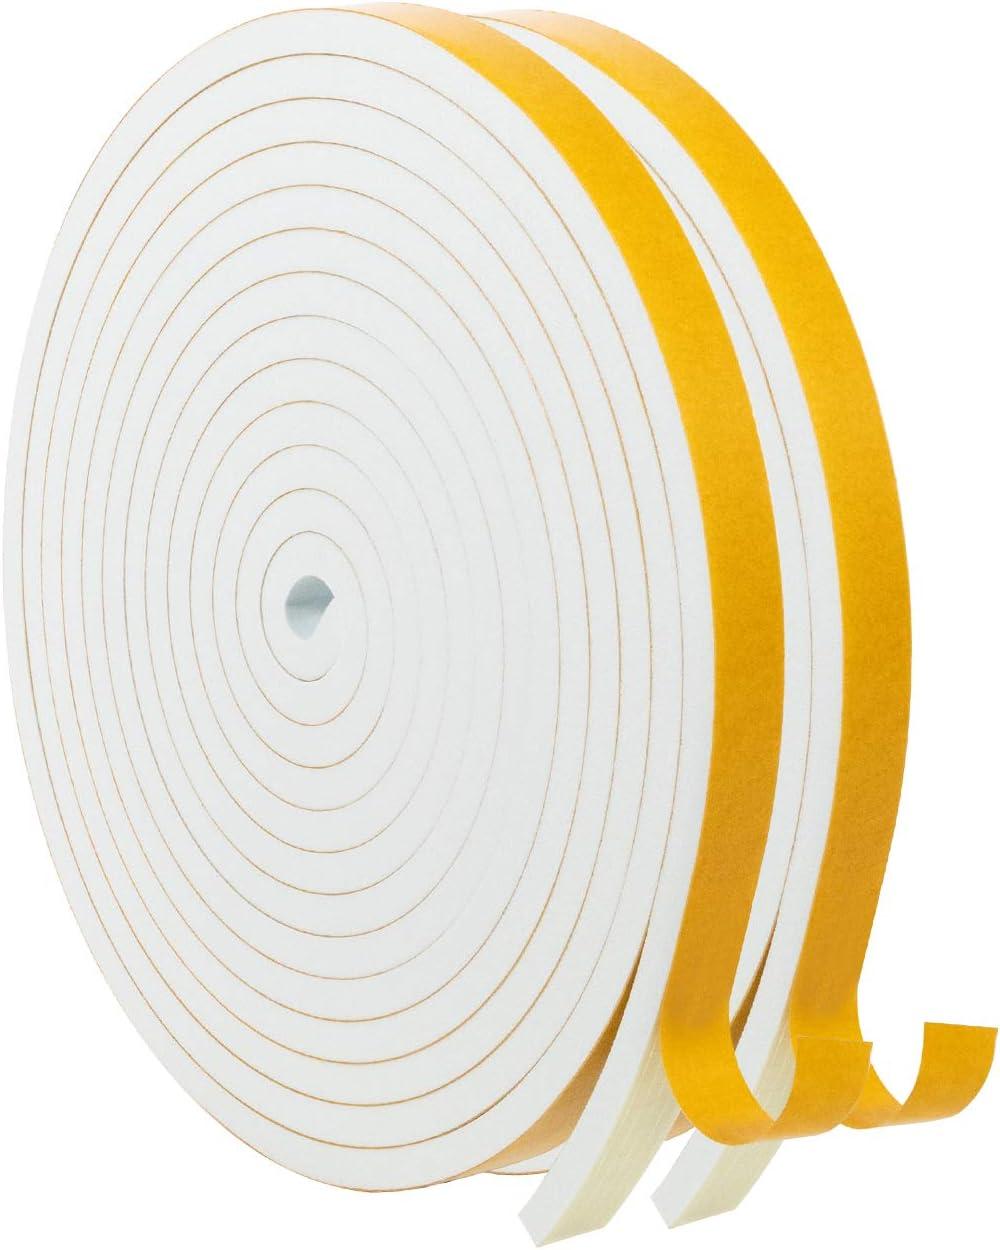 Foam Tape-2 Rolls, 1/2 Inch Wide X 1/4 Inch Thick White Foam Seal Tape High Density Weatherstripping Self Adhesive Door Insulation Foam Rubber Seal Strip Total 26 Feet Long(13ft x 2 Rolls)